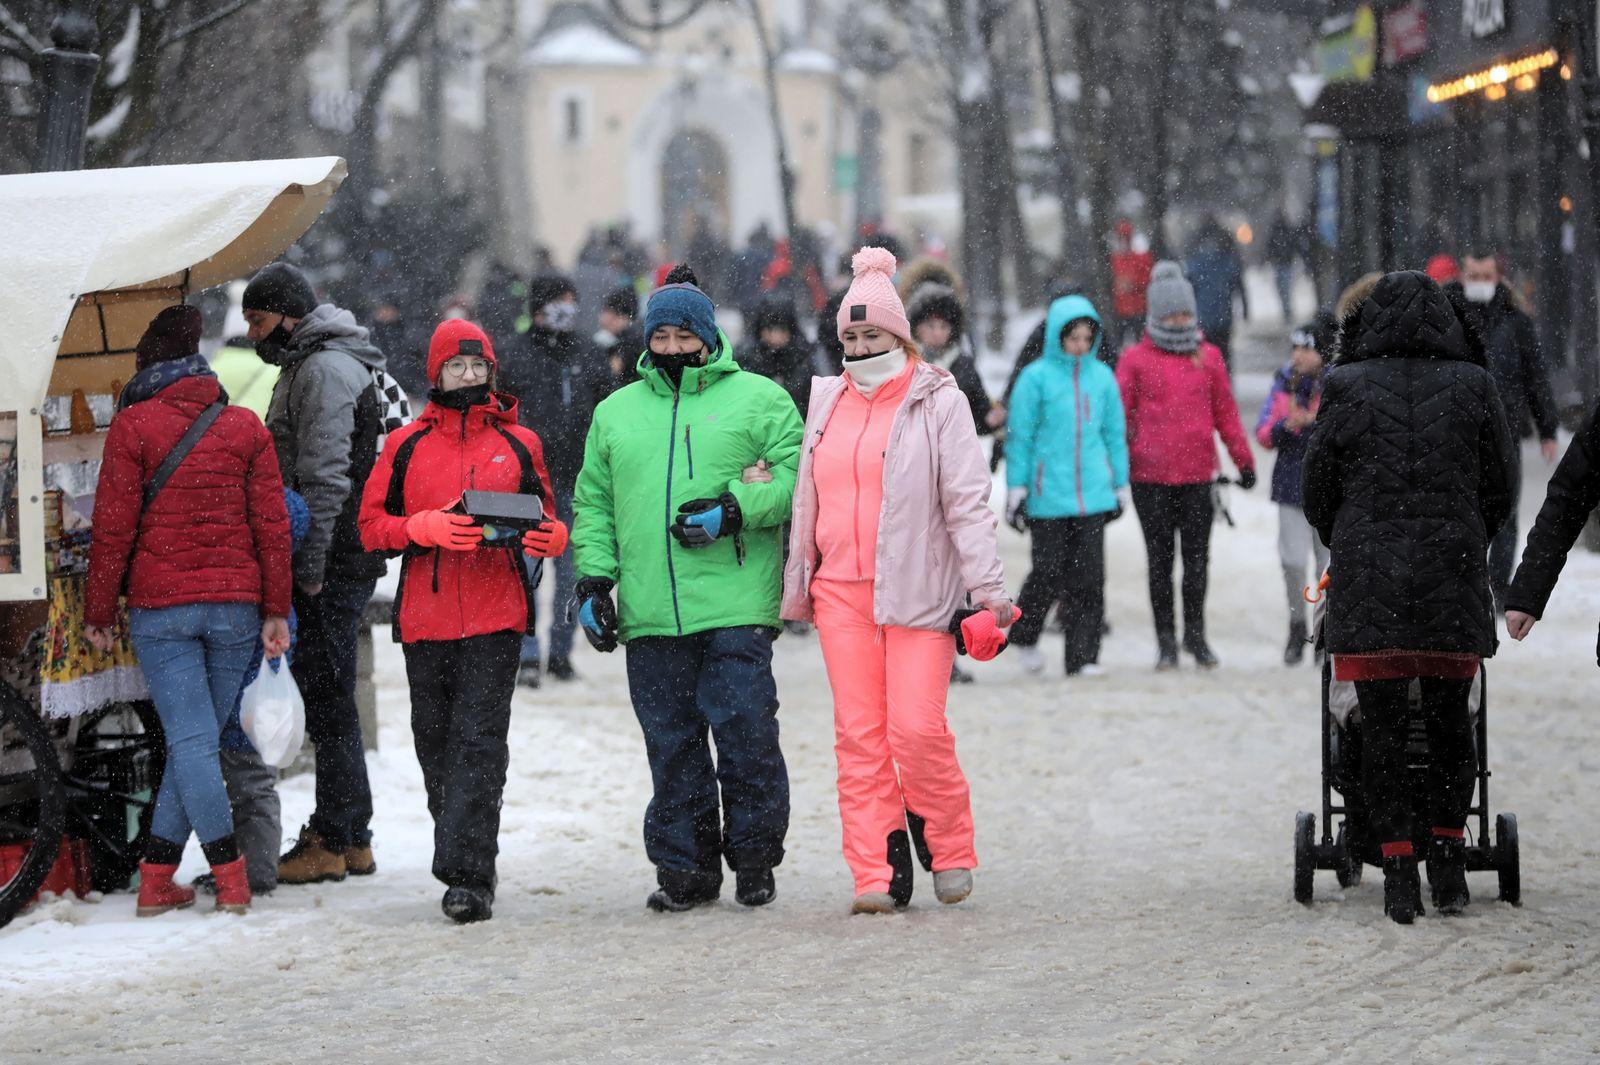 Tourism in Poland, Zakopane - 17 Feb 2021